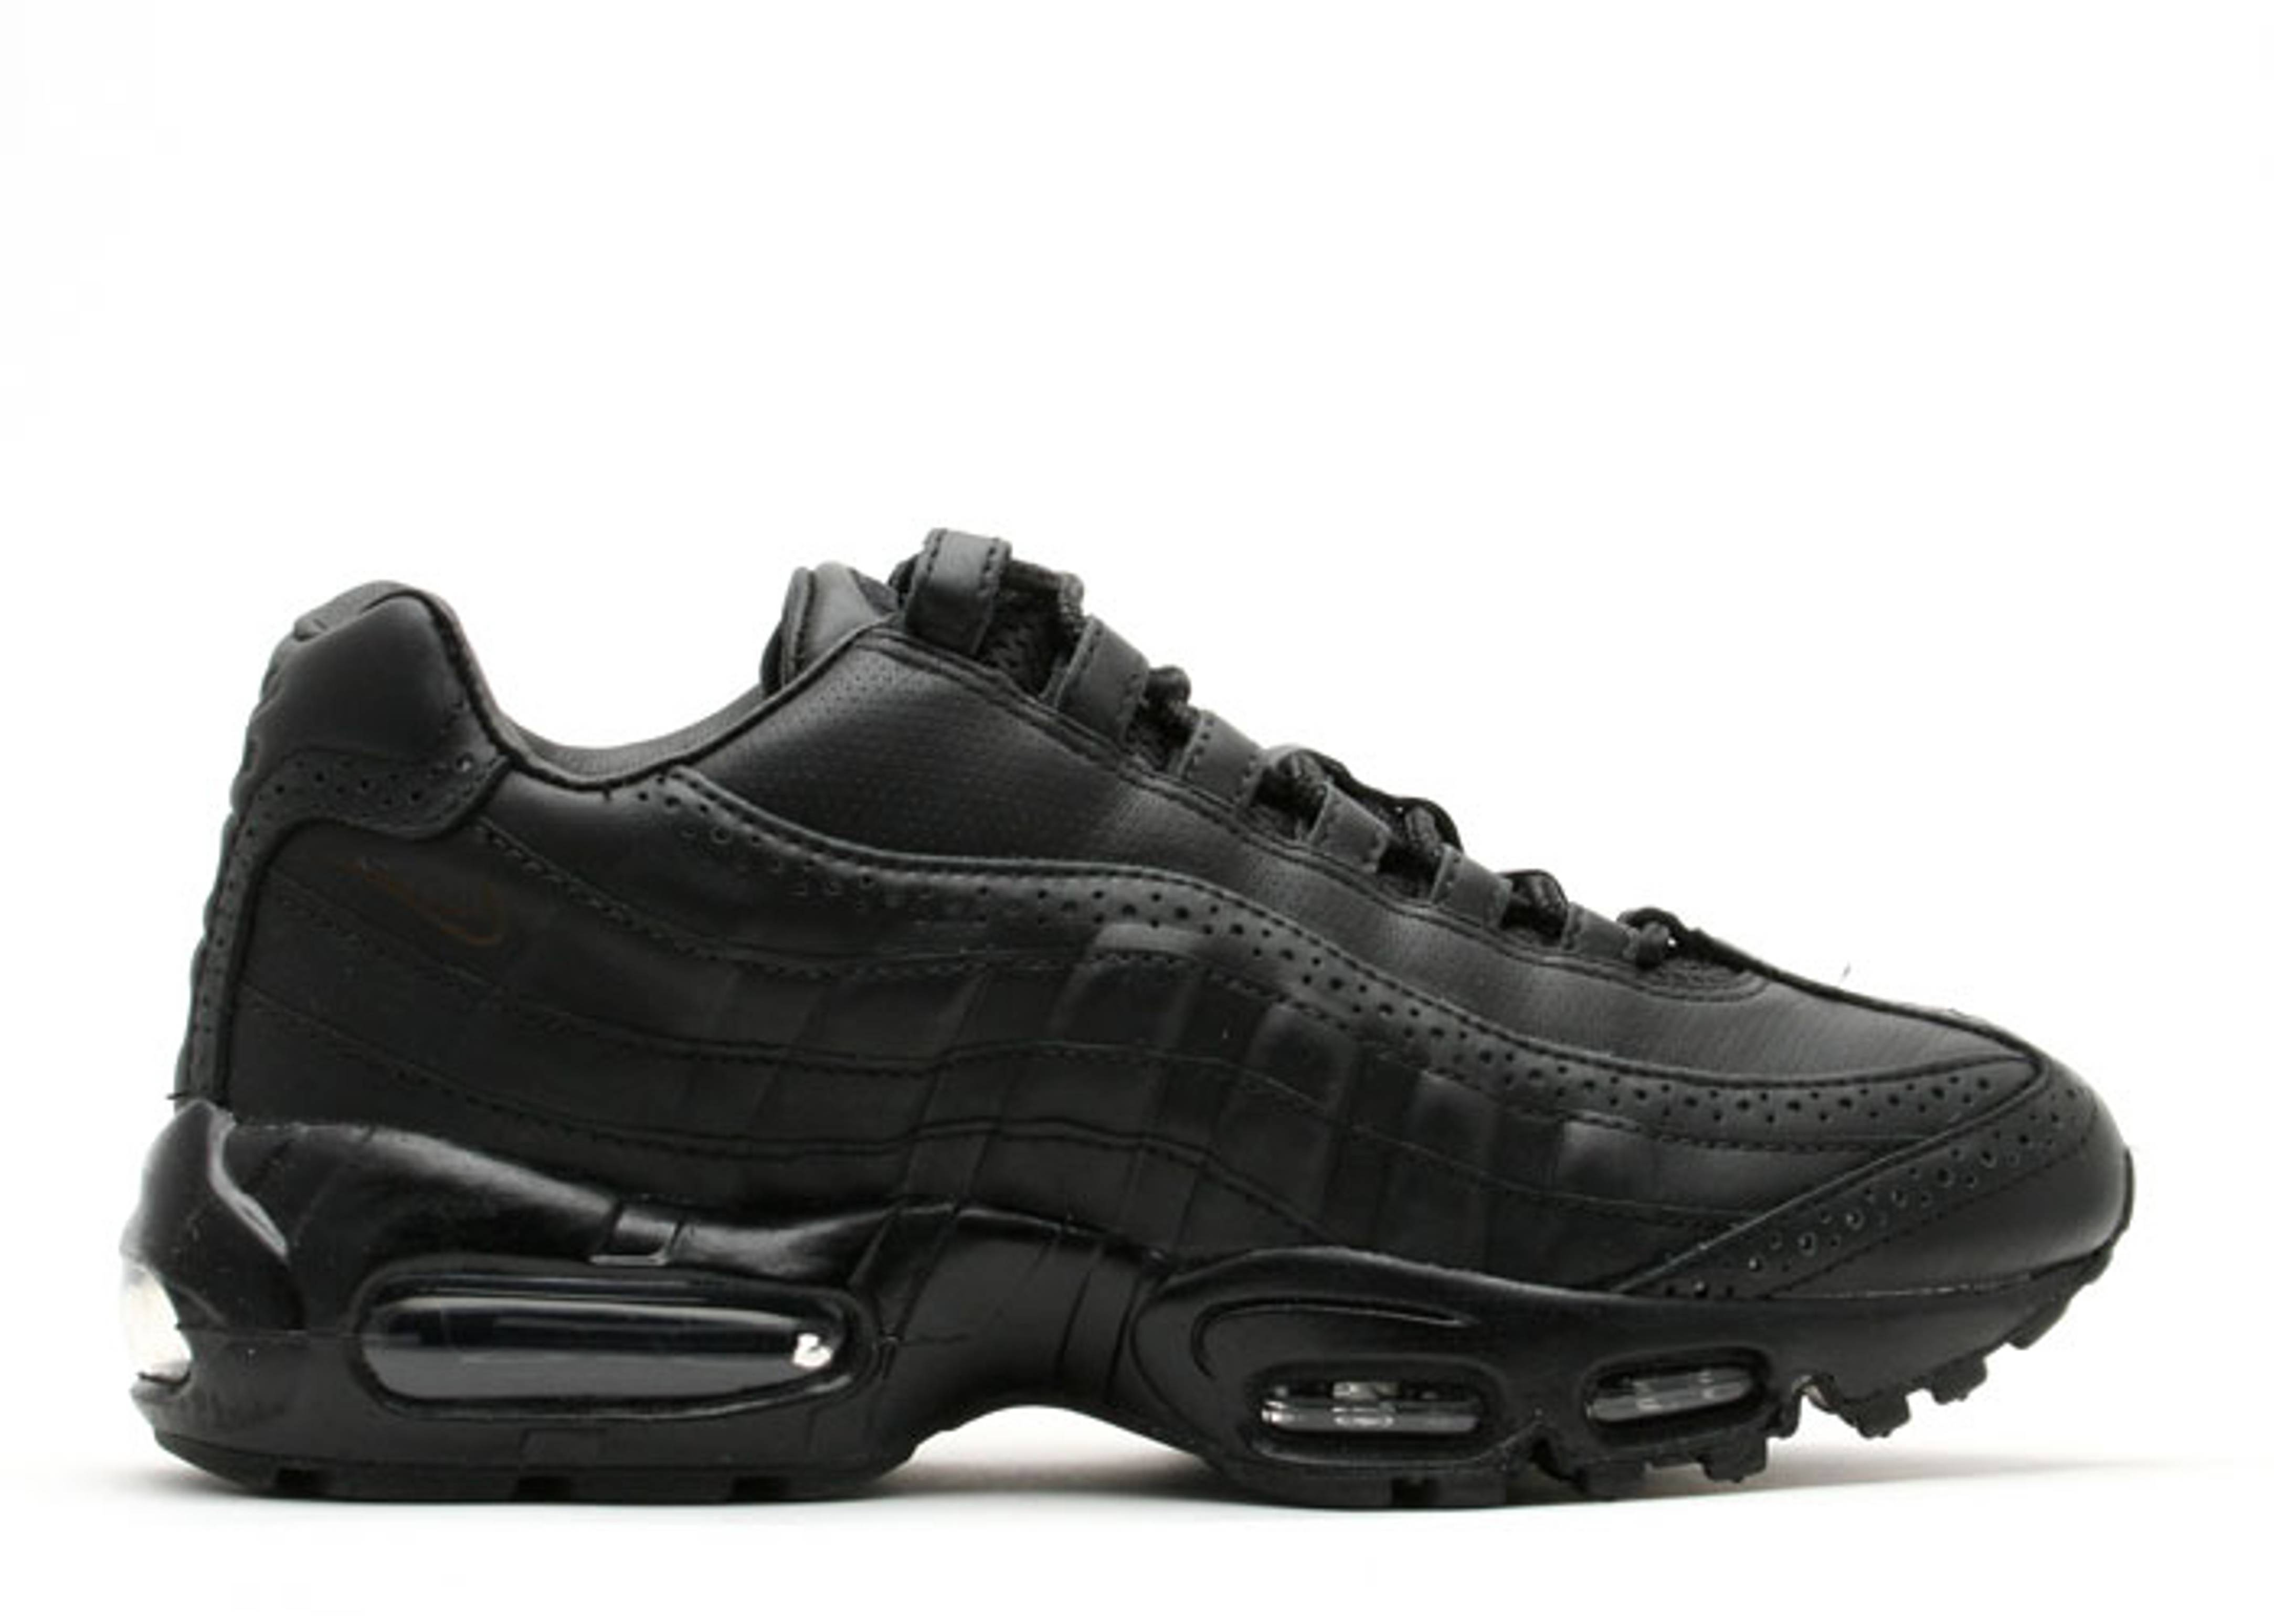 low priced 35a2e 2d298 Air Max 95 Supreme - Nike - 314993 001 - black/black ...